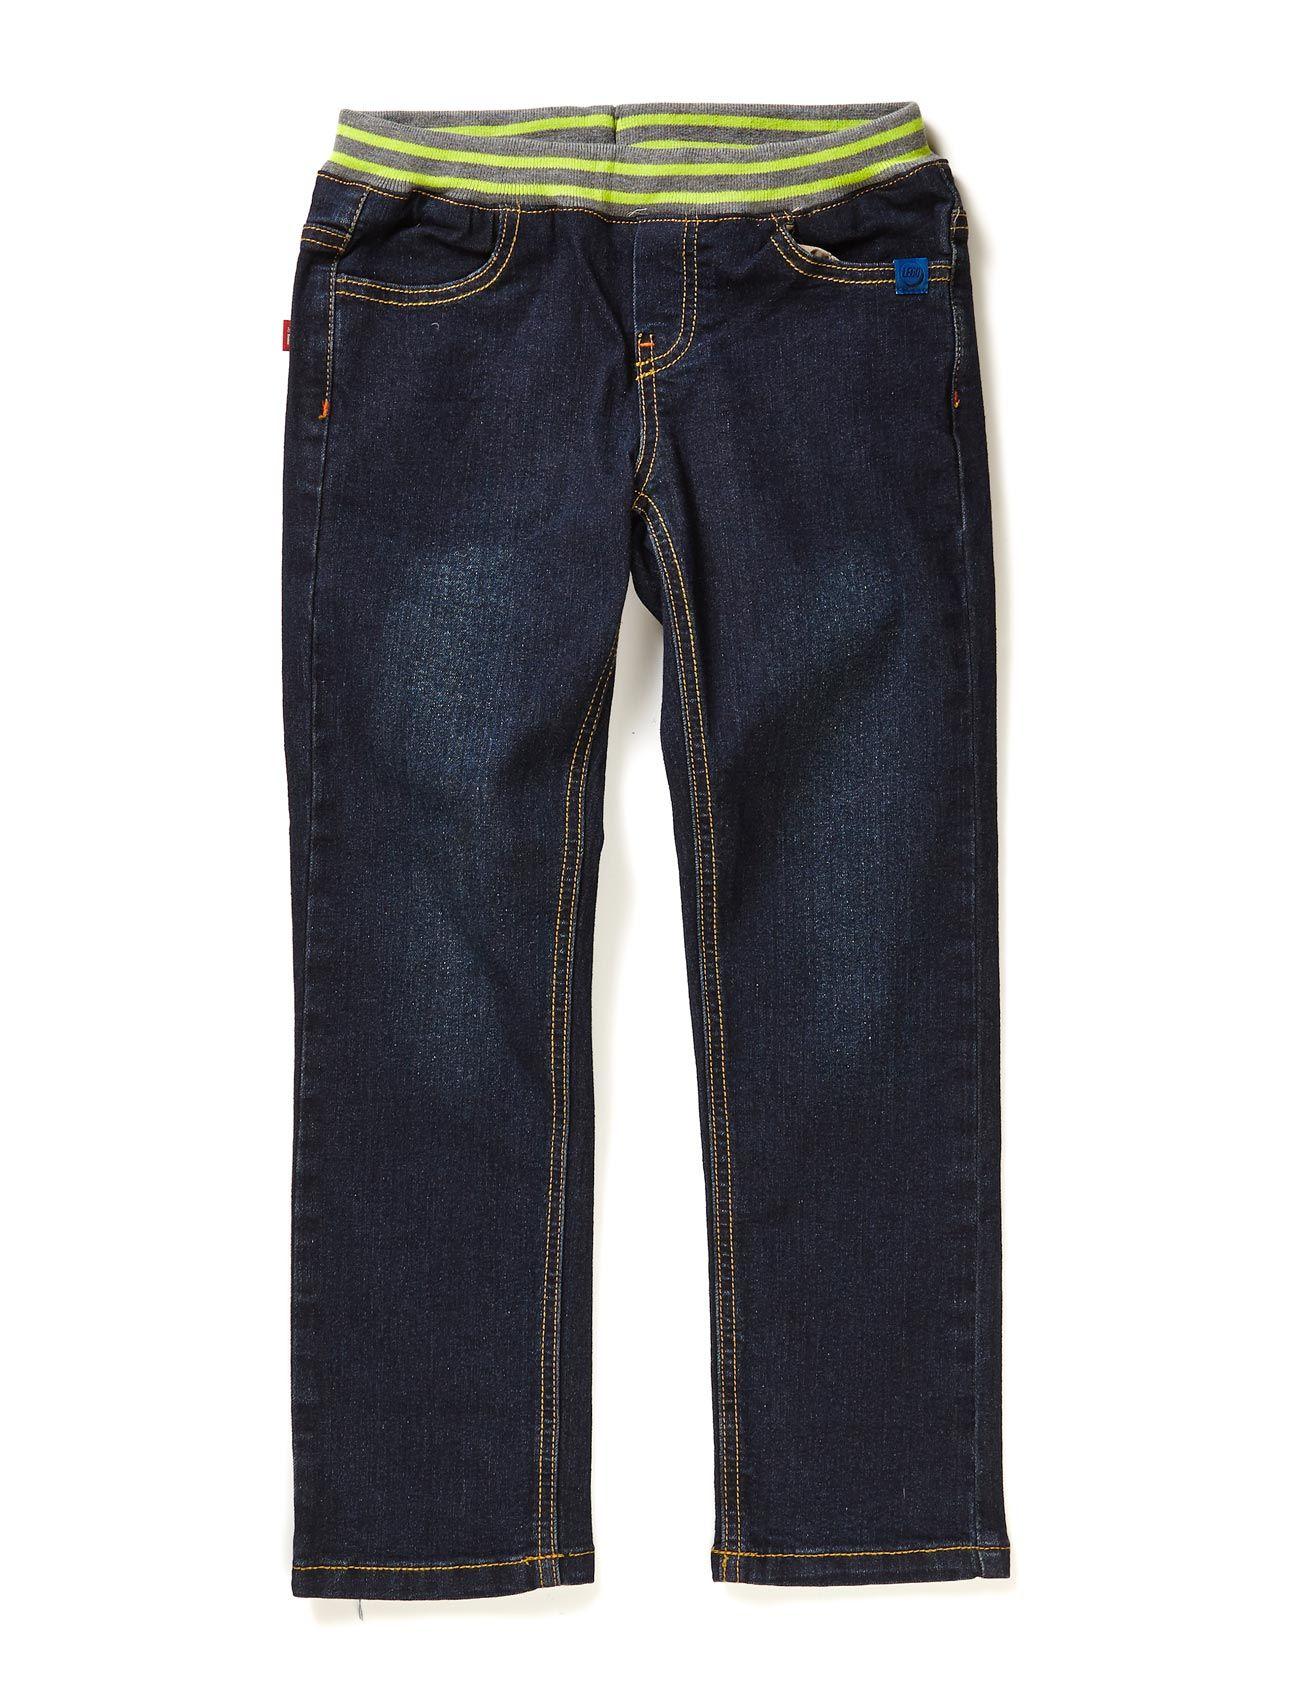 lego wear – Build 501 - jeans på boozt.com dk